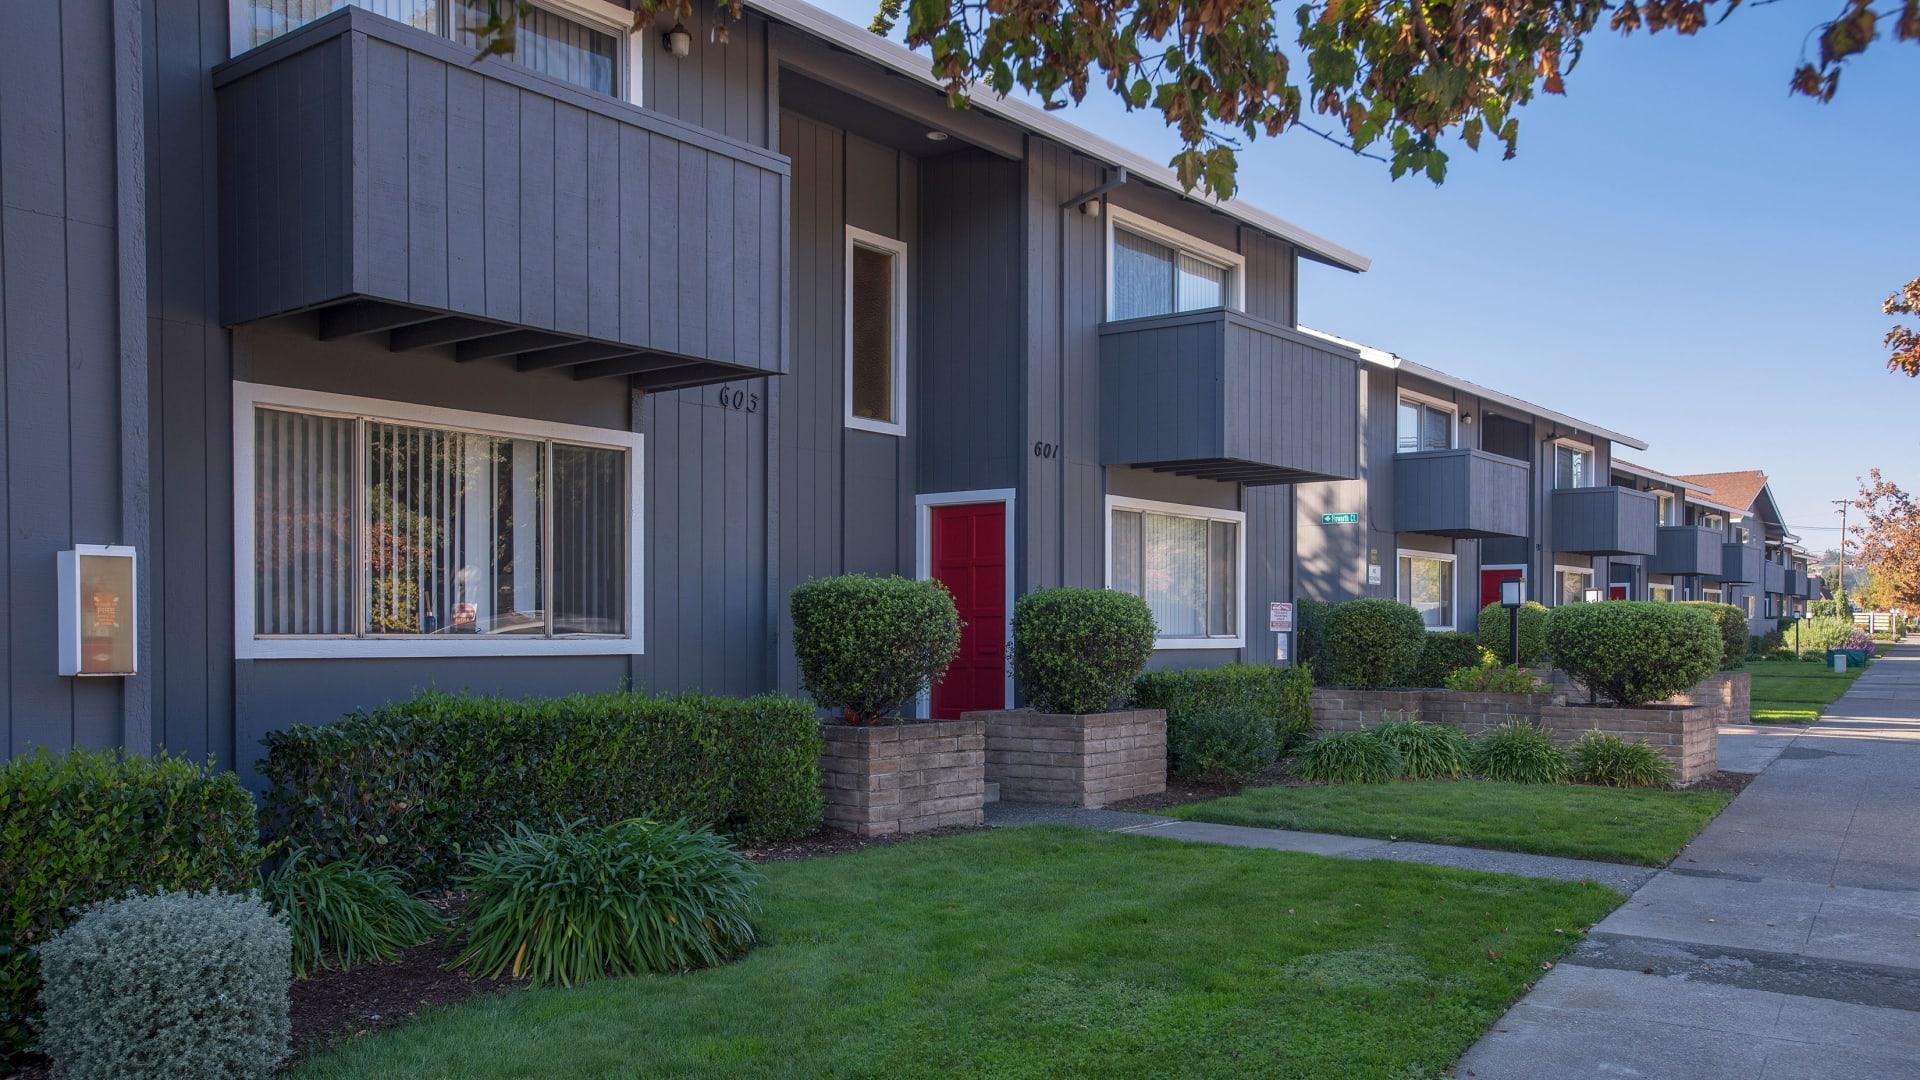 Sidewalk near Spring Lake Apartment Homes in Santa Rosa, California